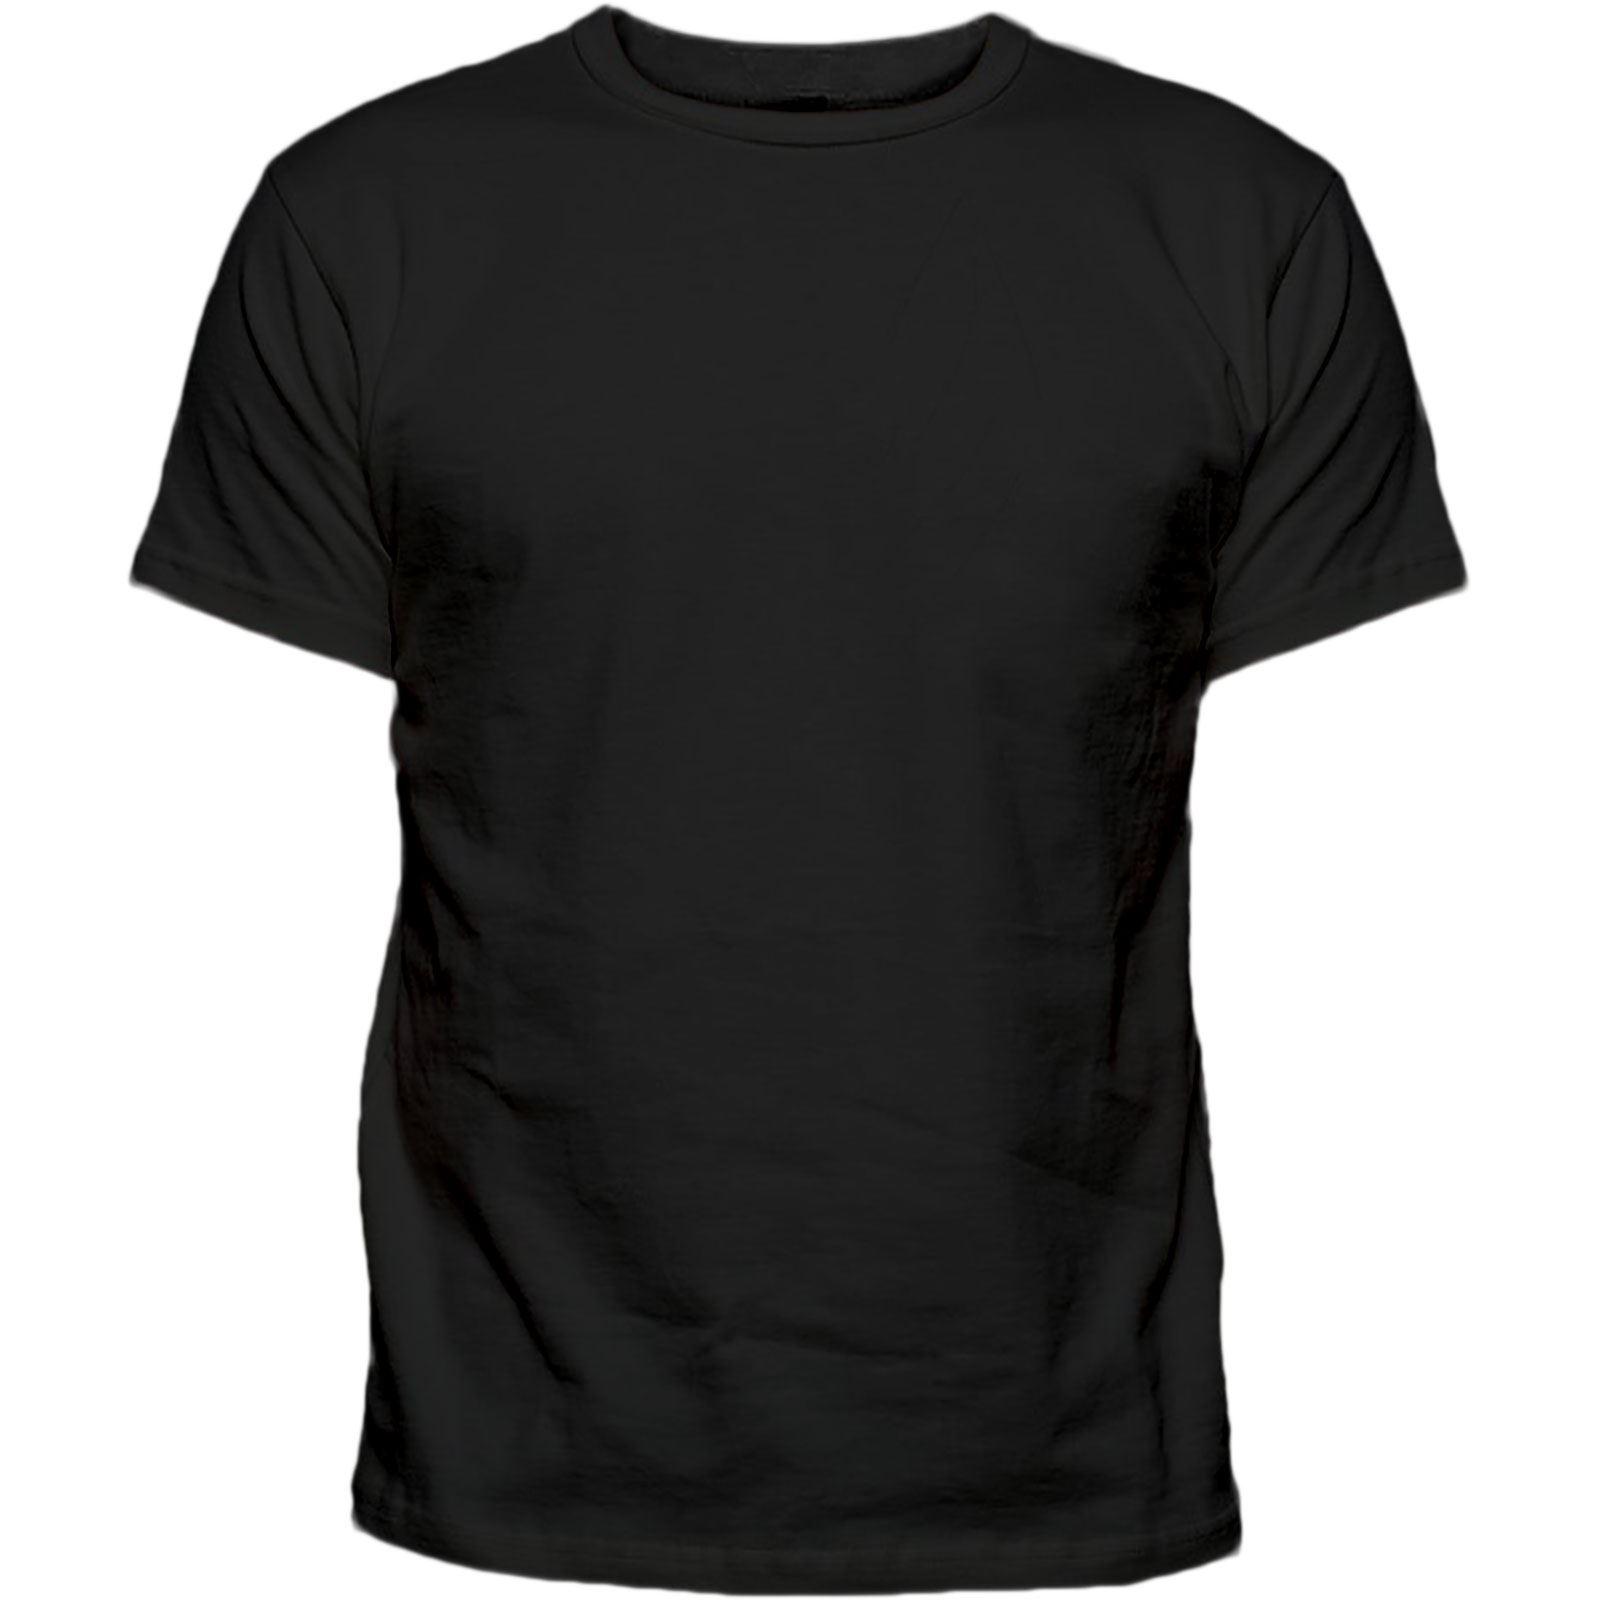 6 or 3 pack mens plain cotton blank basic t shirt casual for Plain t shirt pack